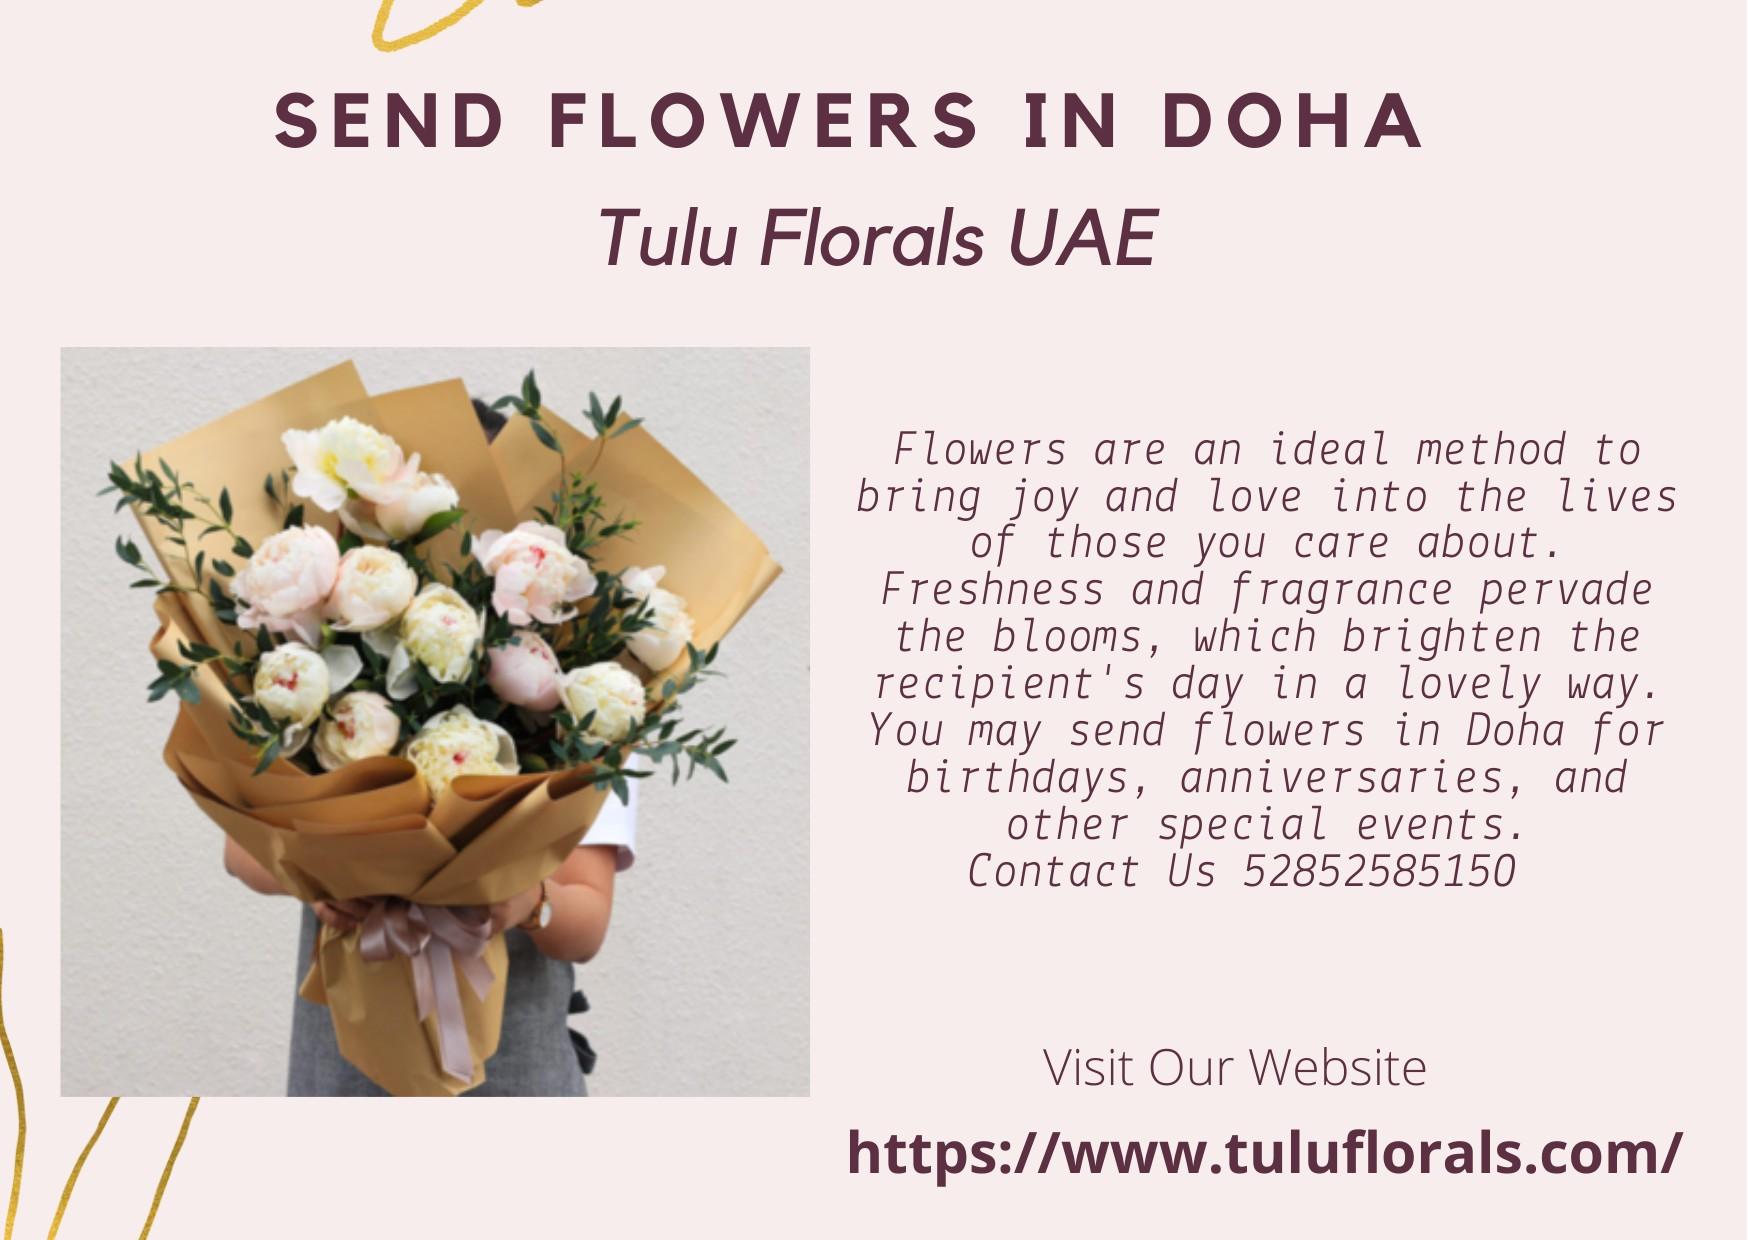 Send Flowers in Doha | Tuluflorals - UAE